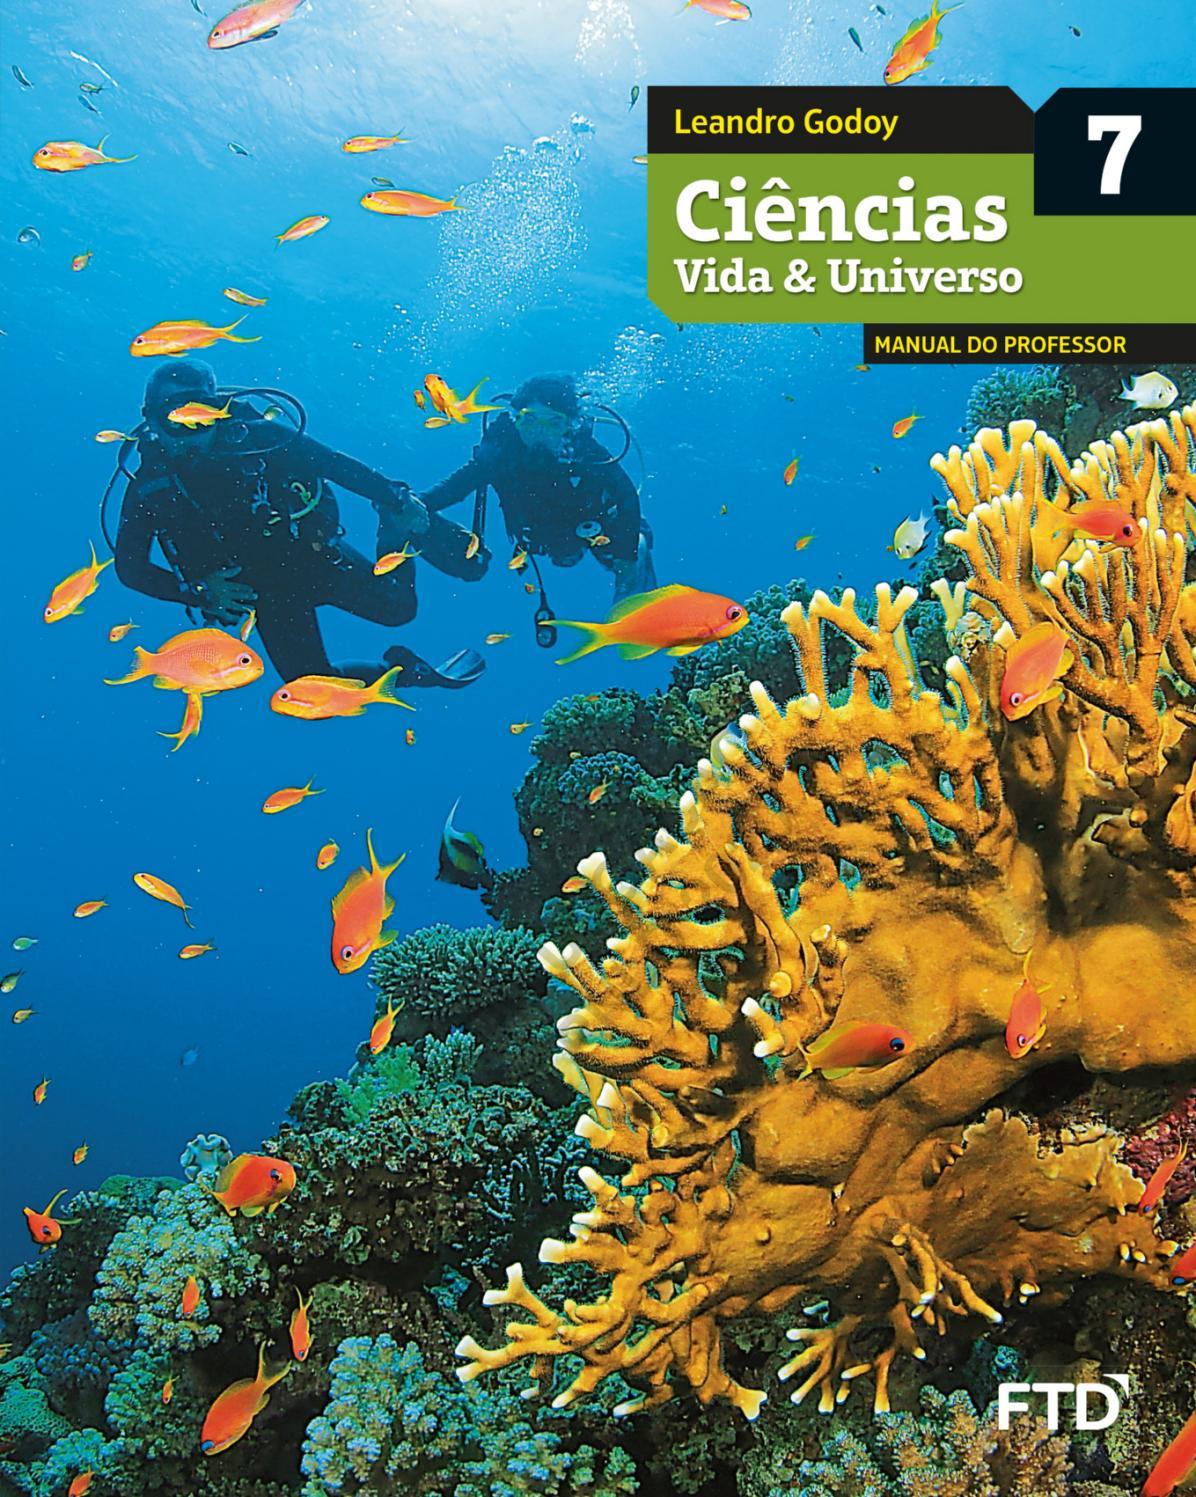 Ciencias Vida 7 By Editora Ftd Issuu